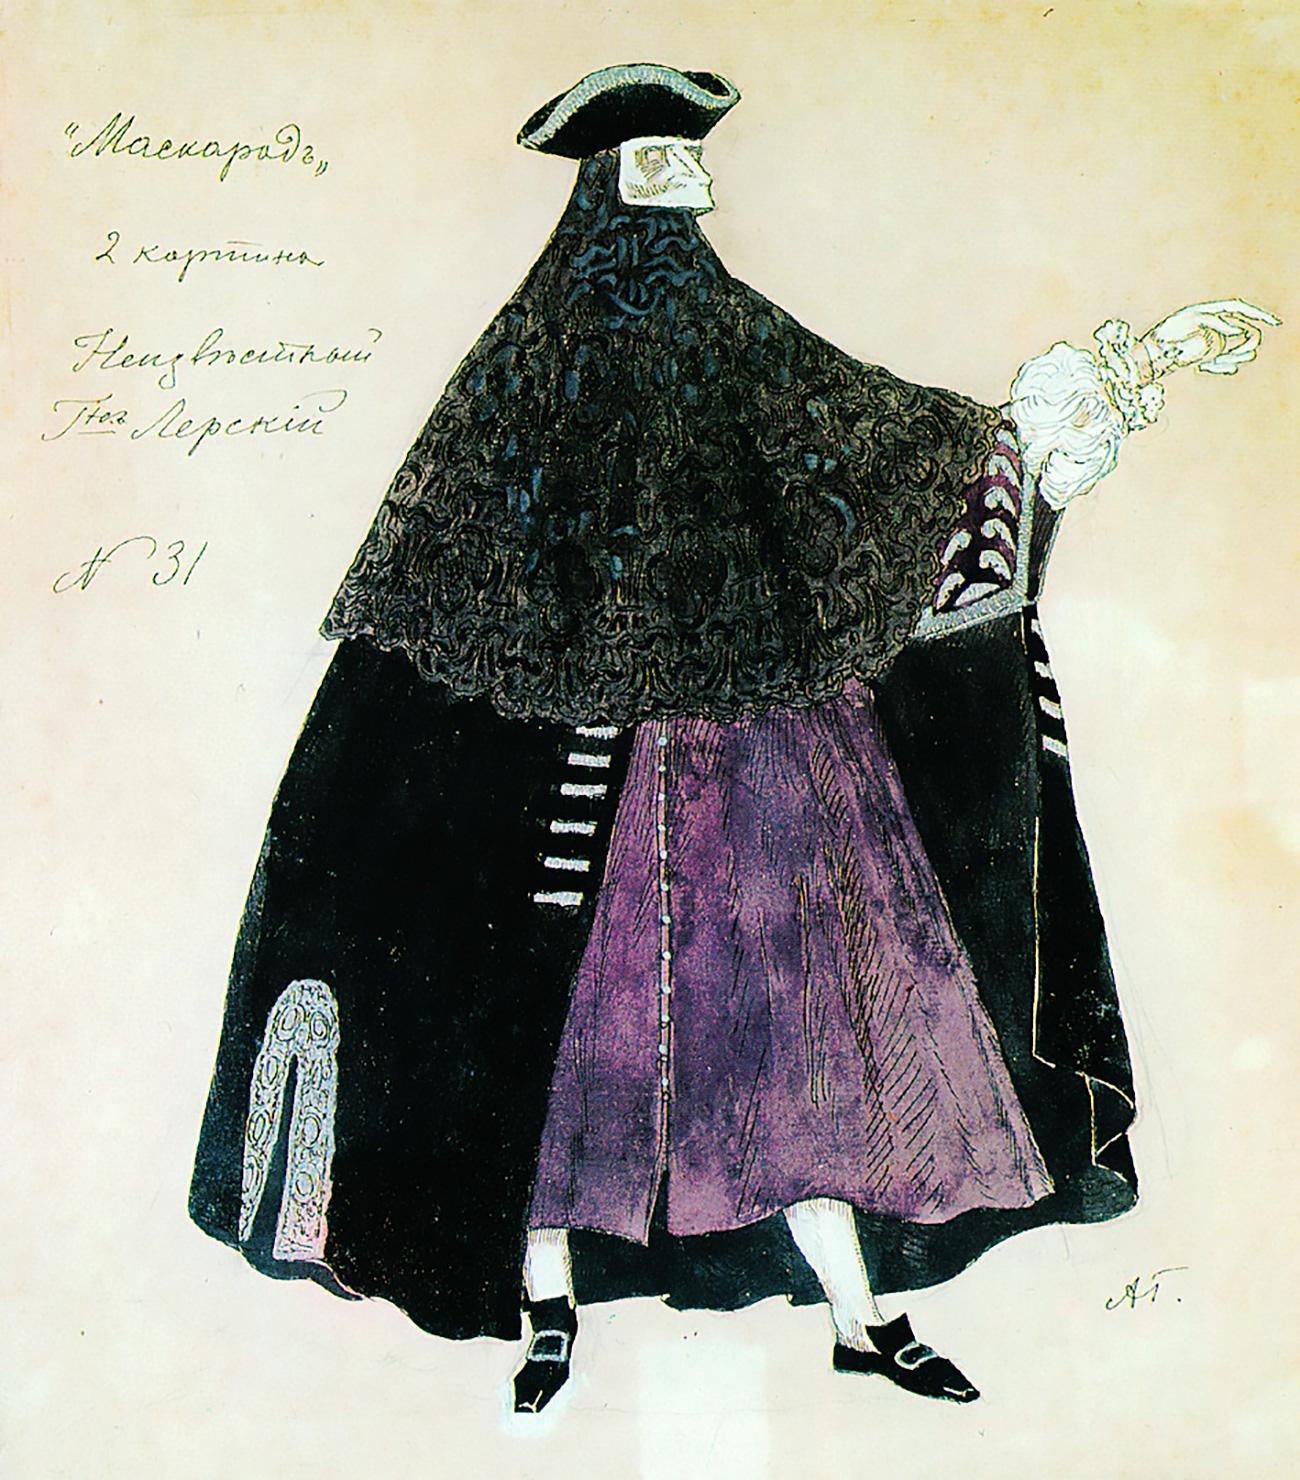 Alexander Golovin's costume design / Alexandrinsky Theatre